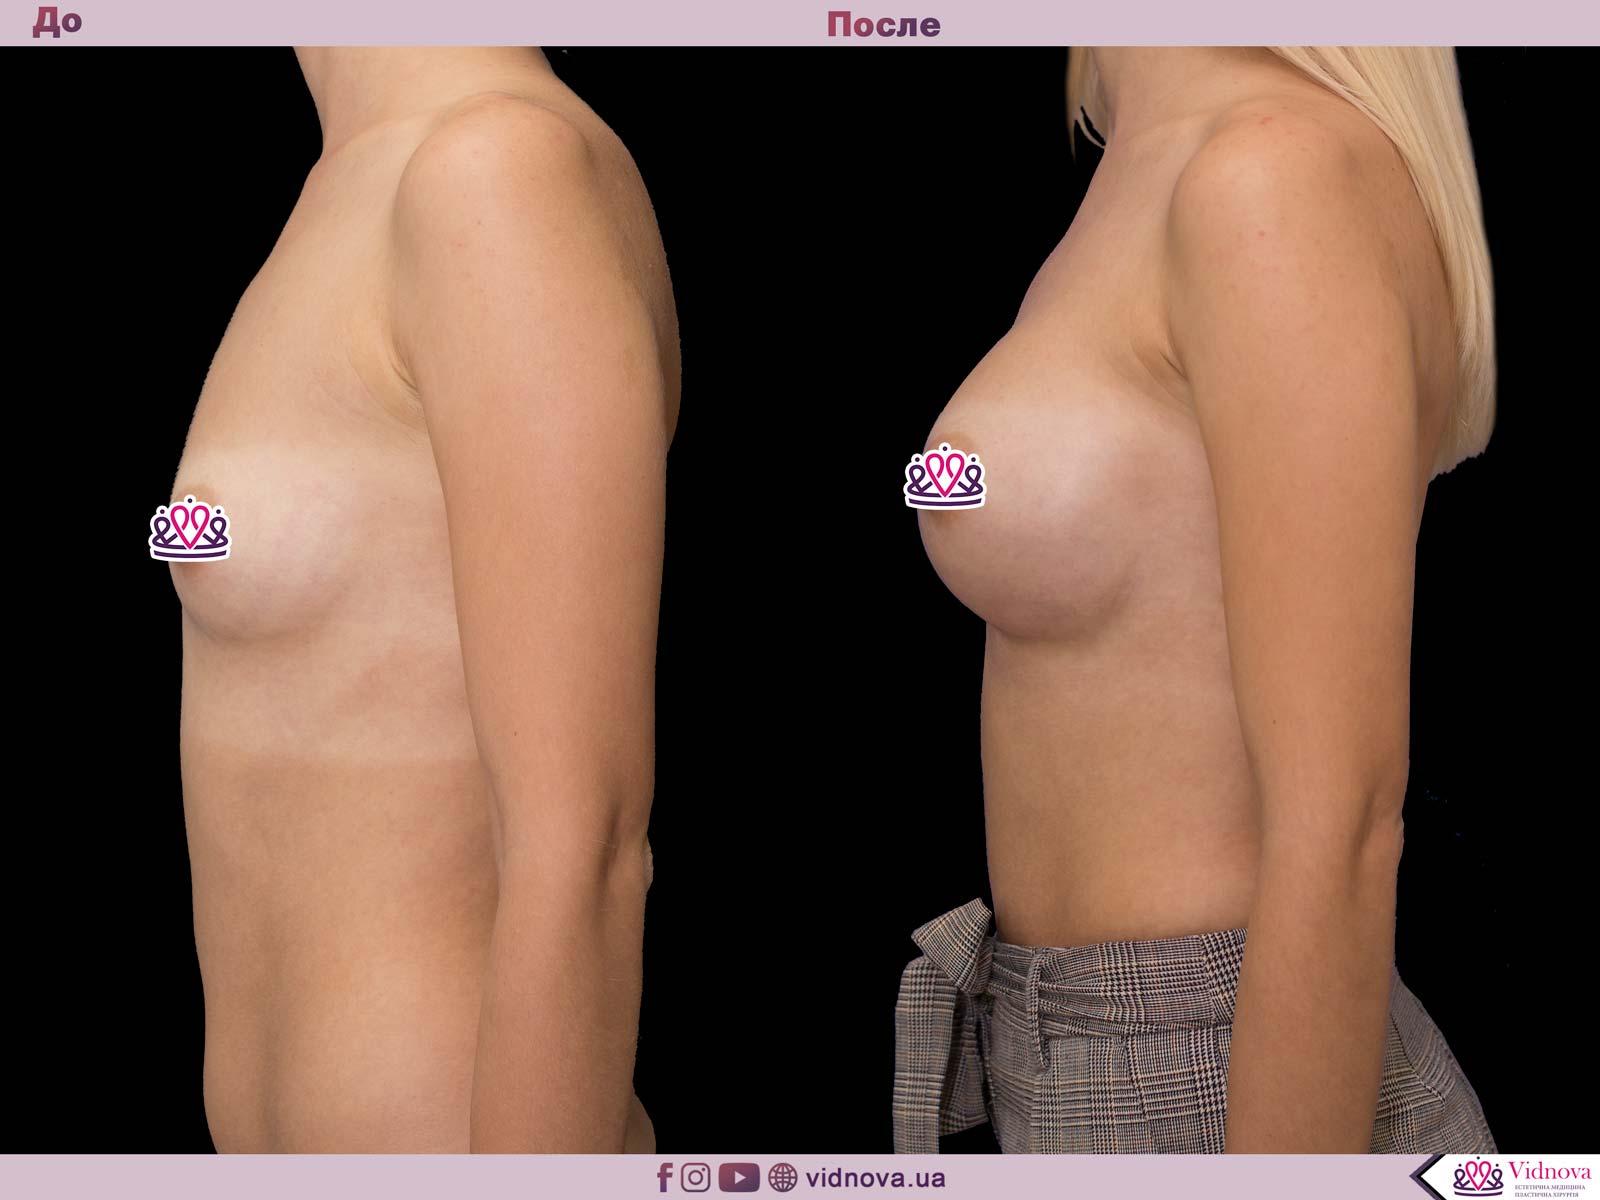 Увеличение груди: Фото ДО и ПОСЛЕ - Пример №41-3 - Клиника Vidnova